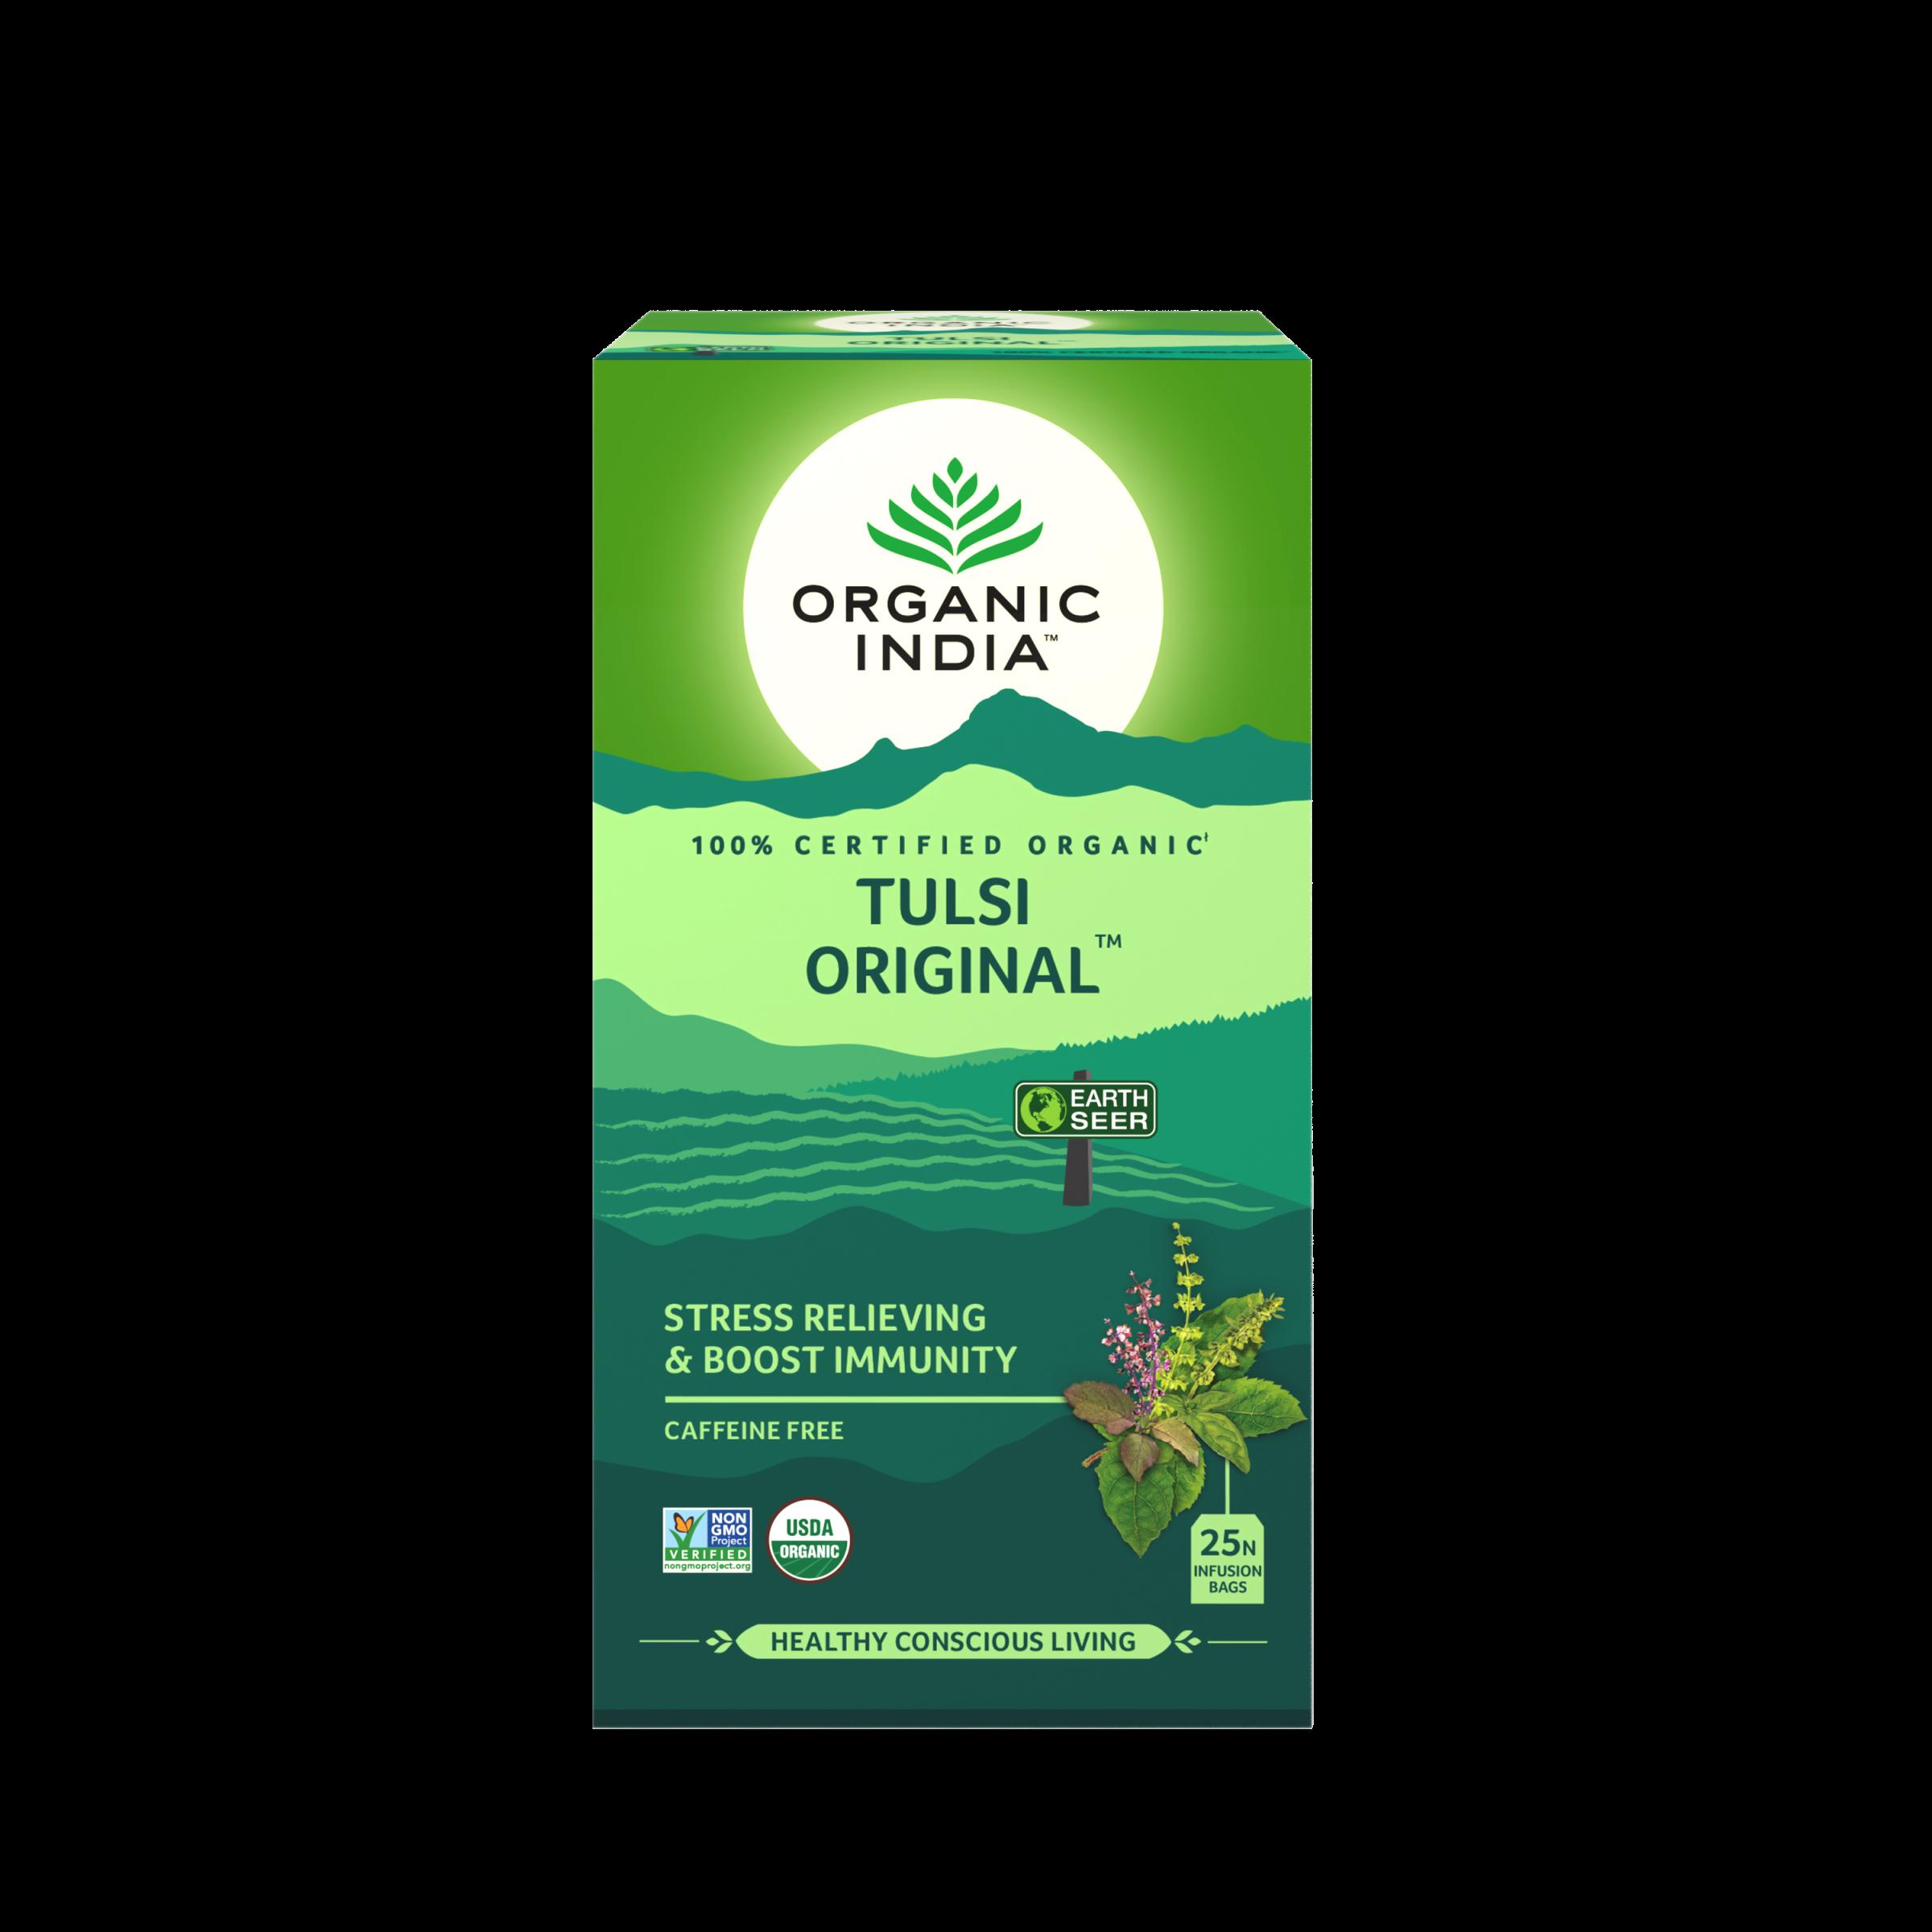 Té Organic India Tulsi en bolsa Original